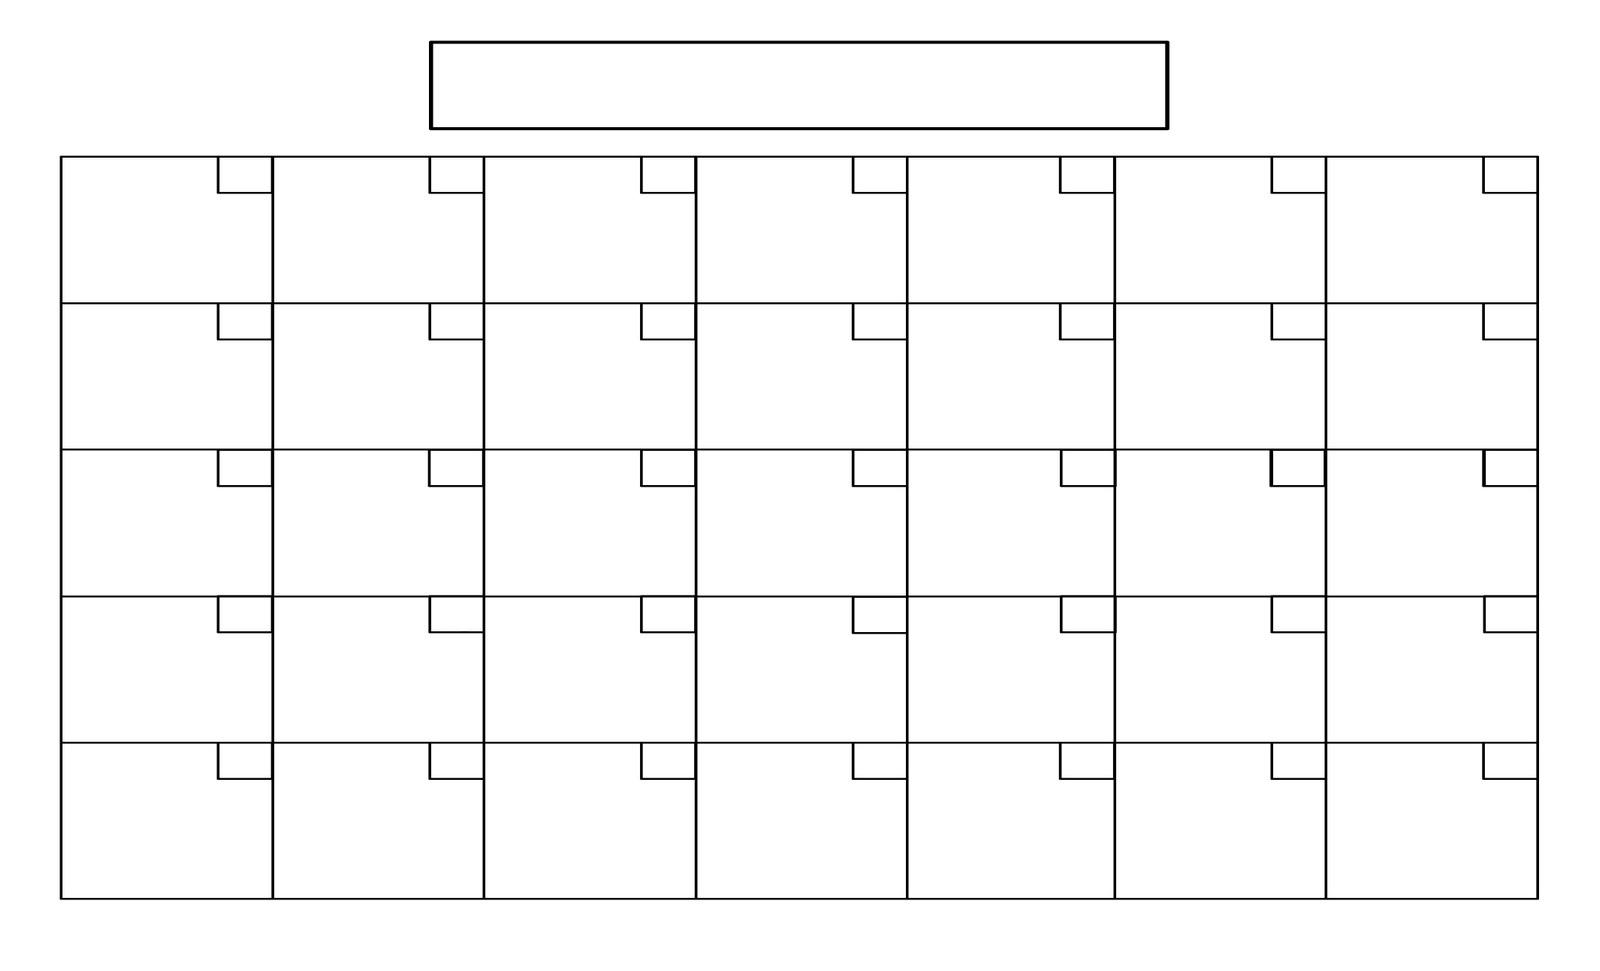 Printable Blank 31 Day Calendar | Template Calendar Printable pertaining to 31 Day Blank Calendar Template